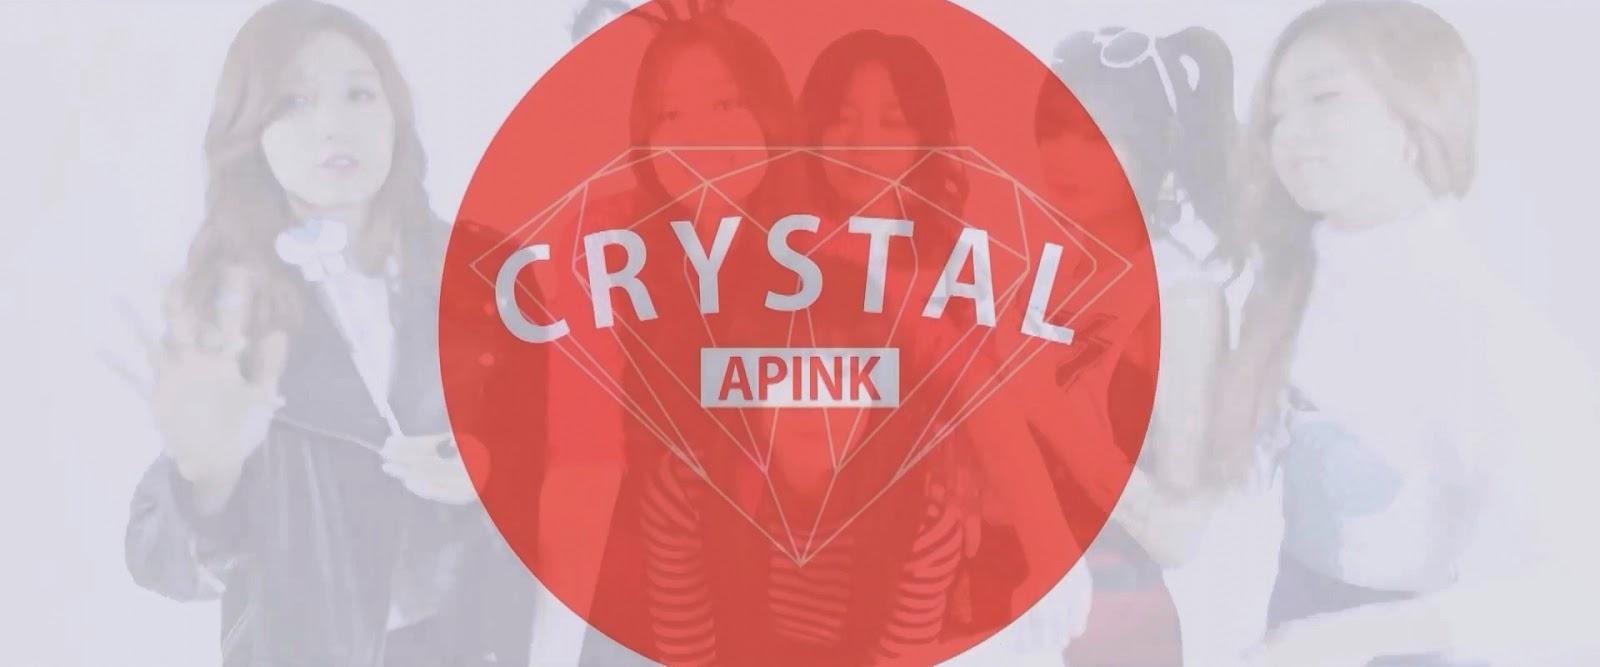 APink Crystal